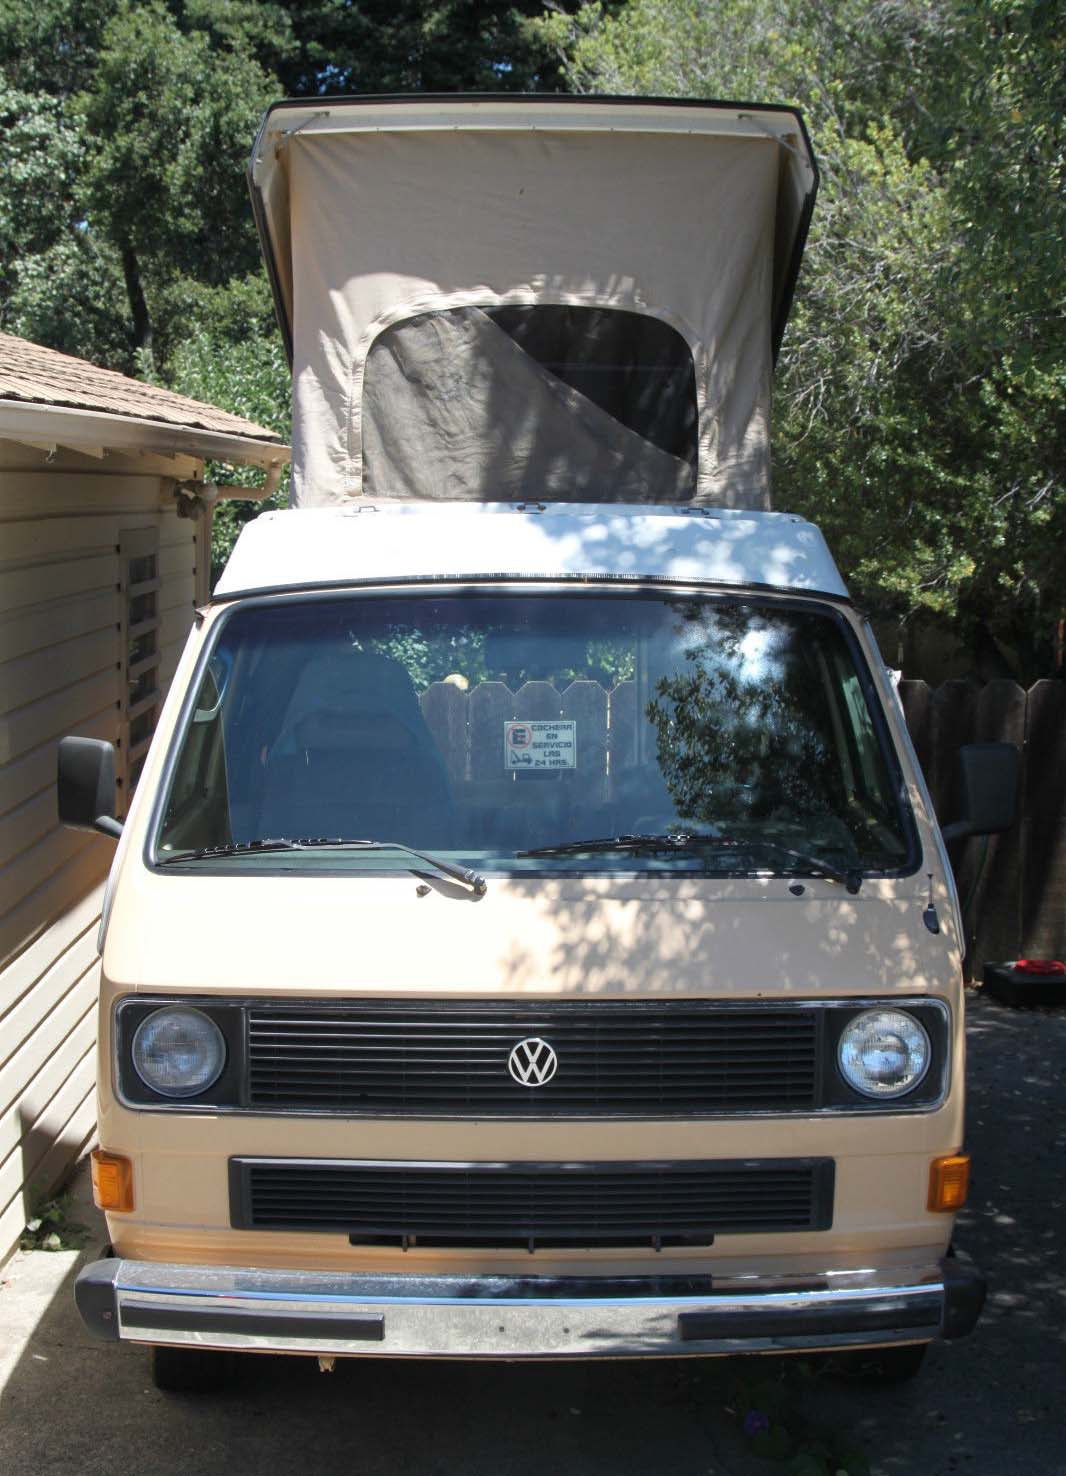 1985 VW Vanagon Westfalia Camper w/160k Miles - Auction In Sebas